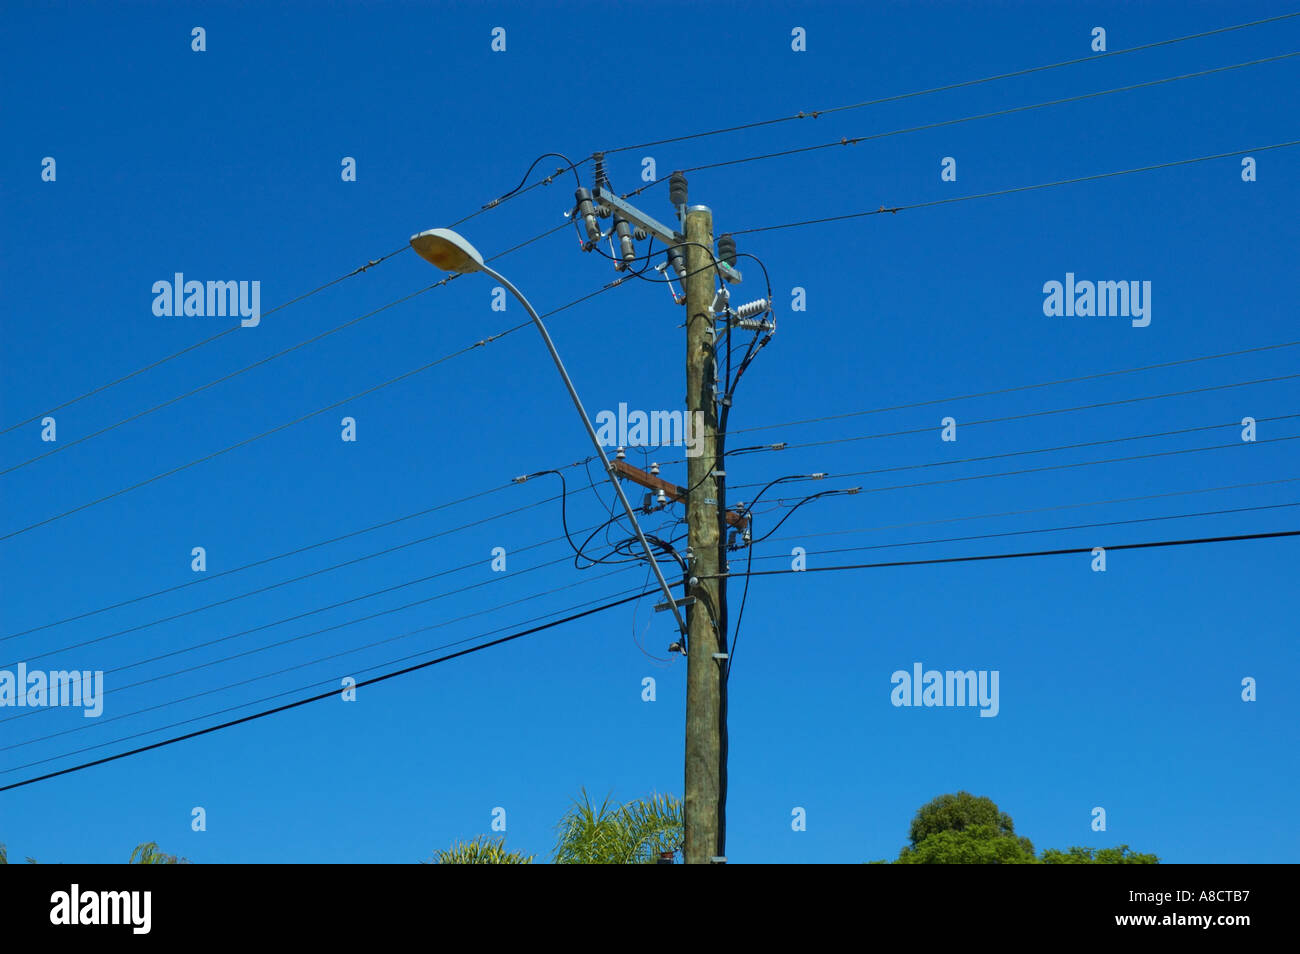 Western australia perth wooden street lamp post with power supply western australia perth wooden street lamp post with power supply lines mozeypictures Images